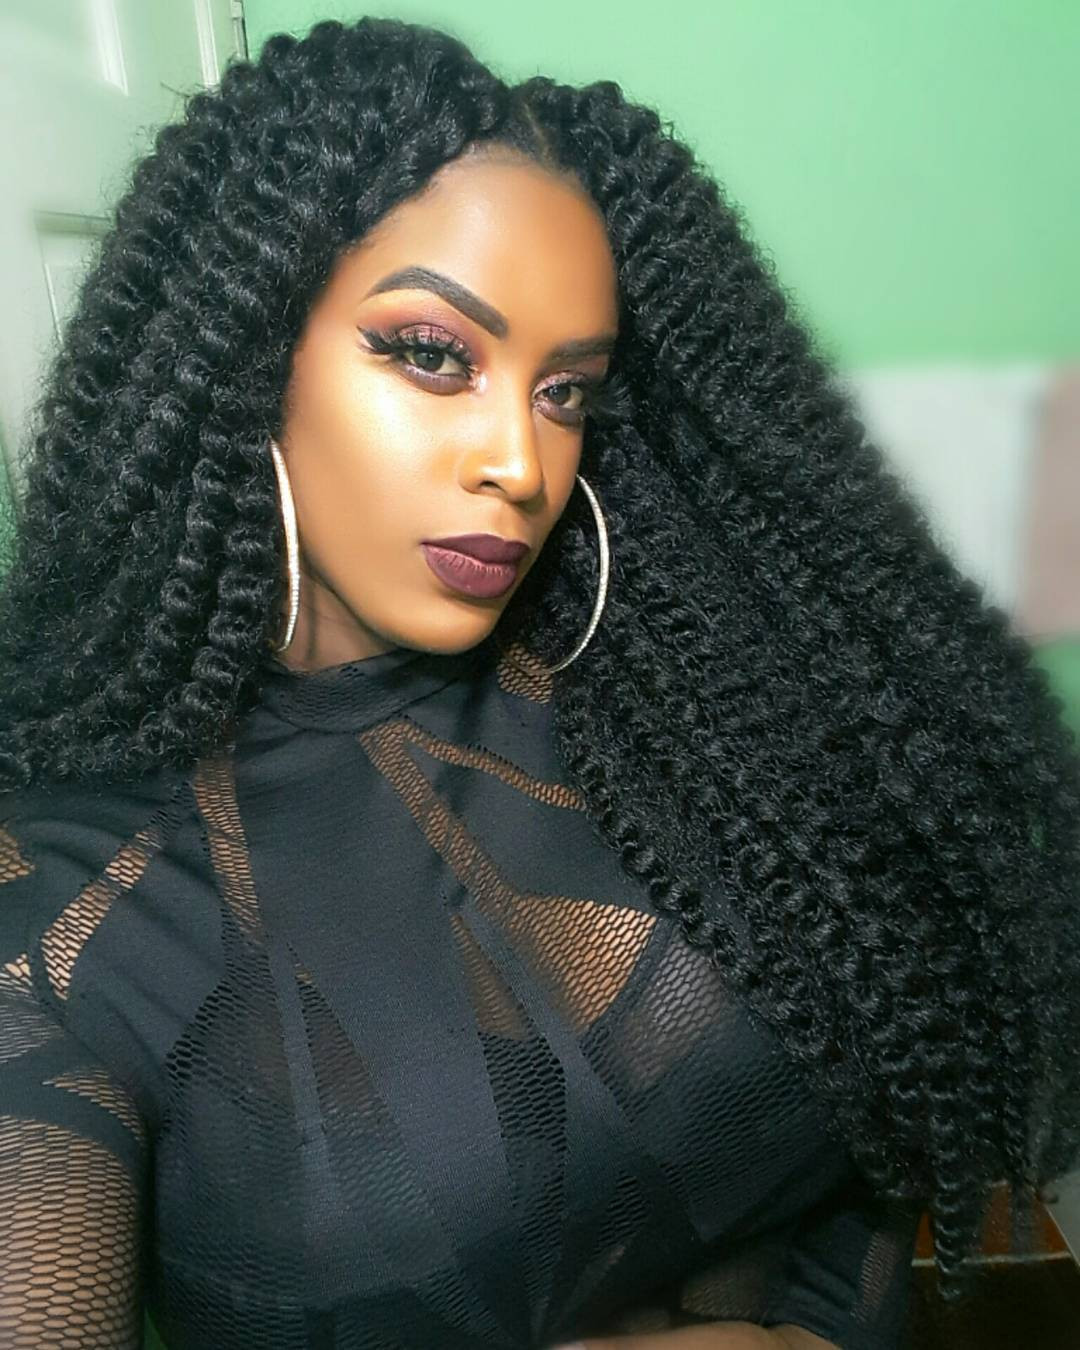 Best ideas about Crochet Braid Hairstyles . Save or Pin 20 Trendy Crochet Braid Hairstyles Now.